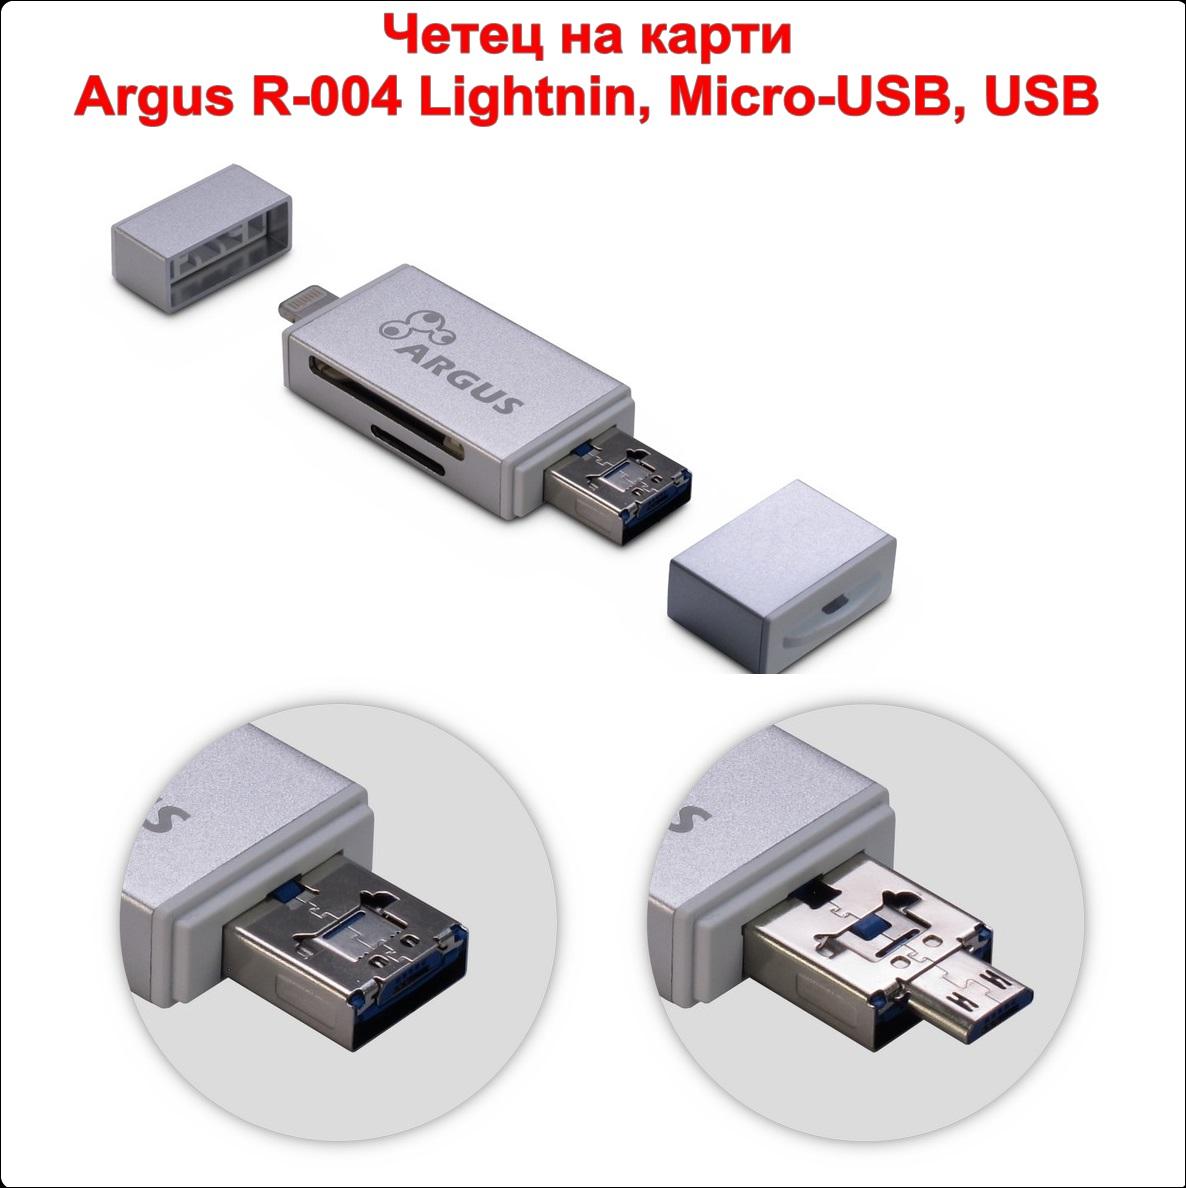 Четец за карти Argus R-004 (Lightnin, Micro-USB)